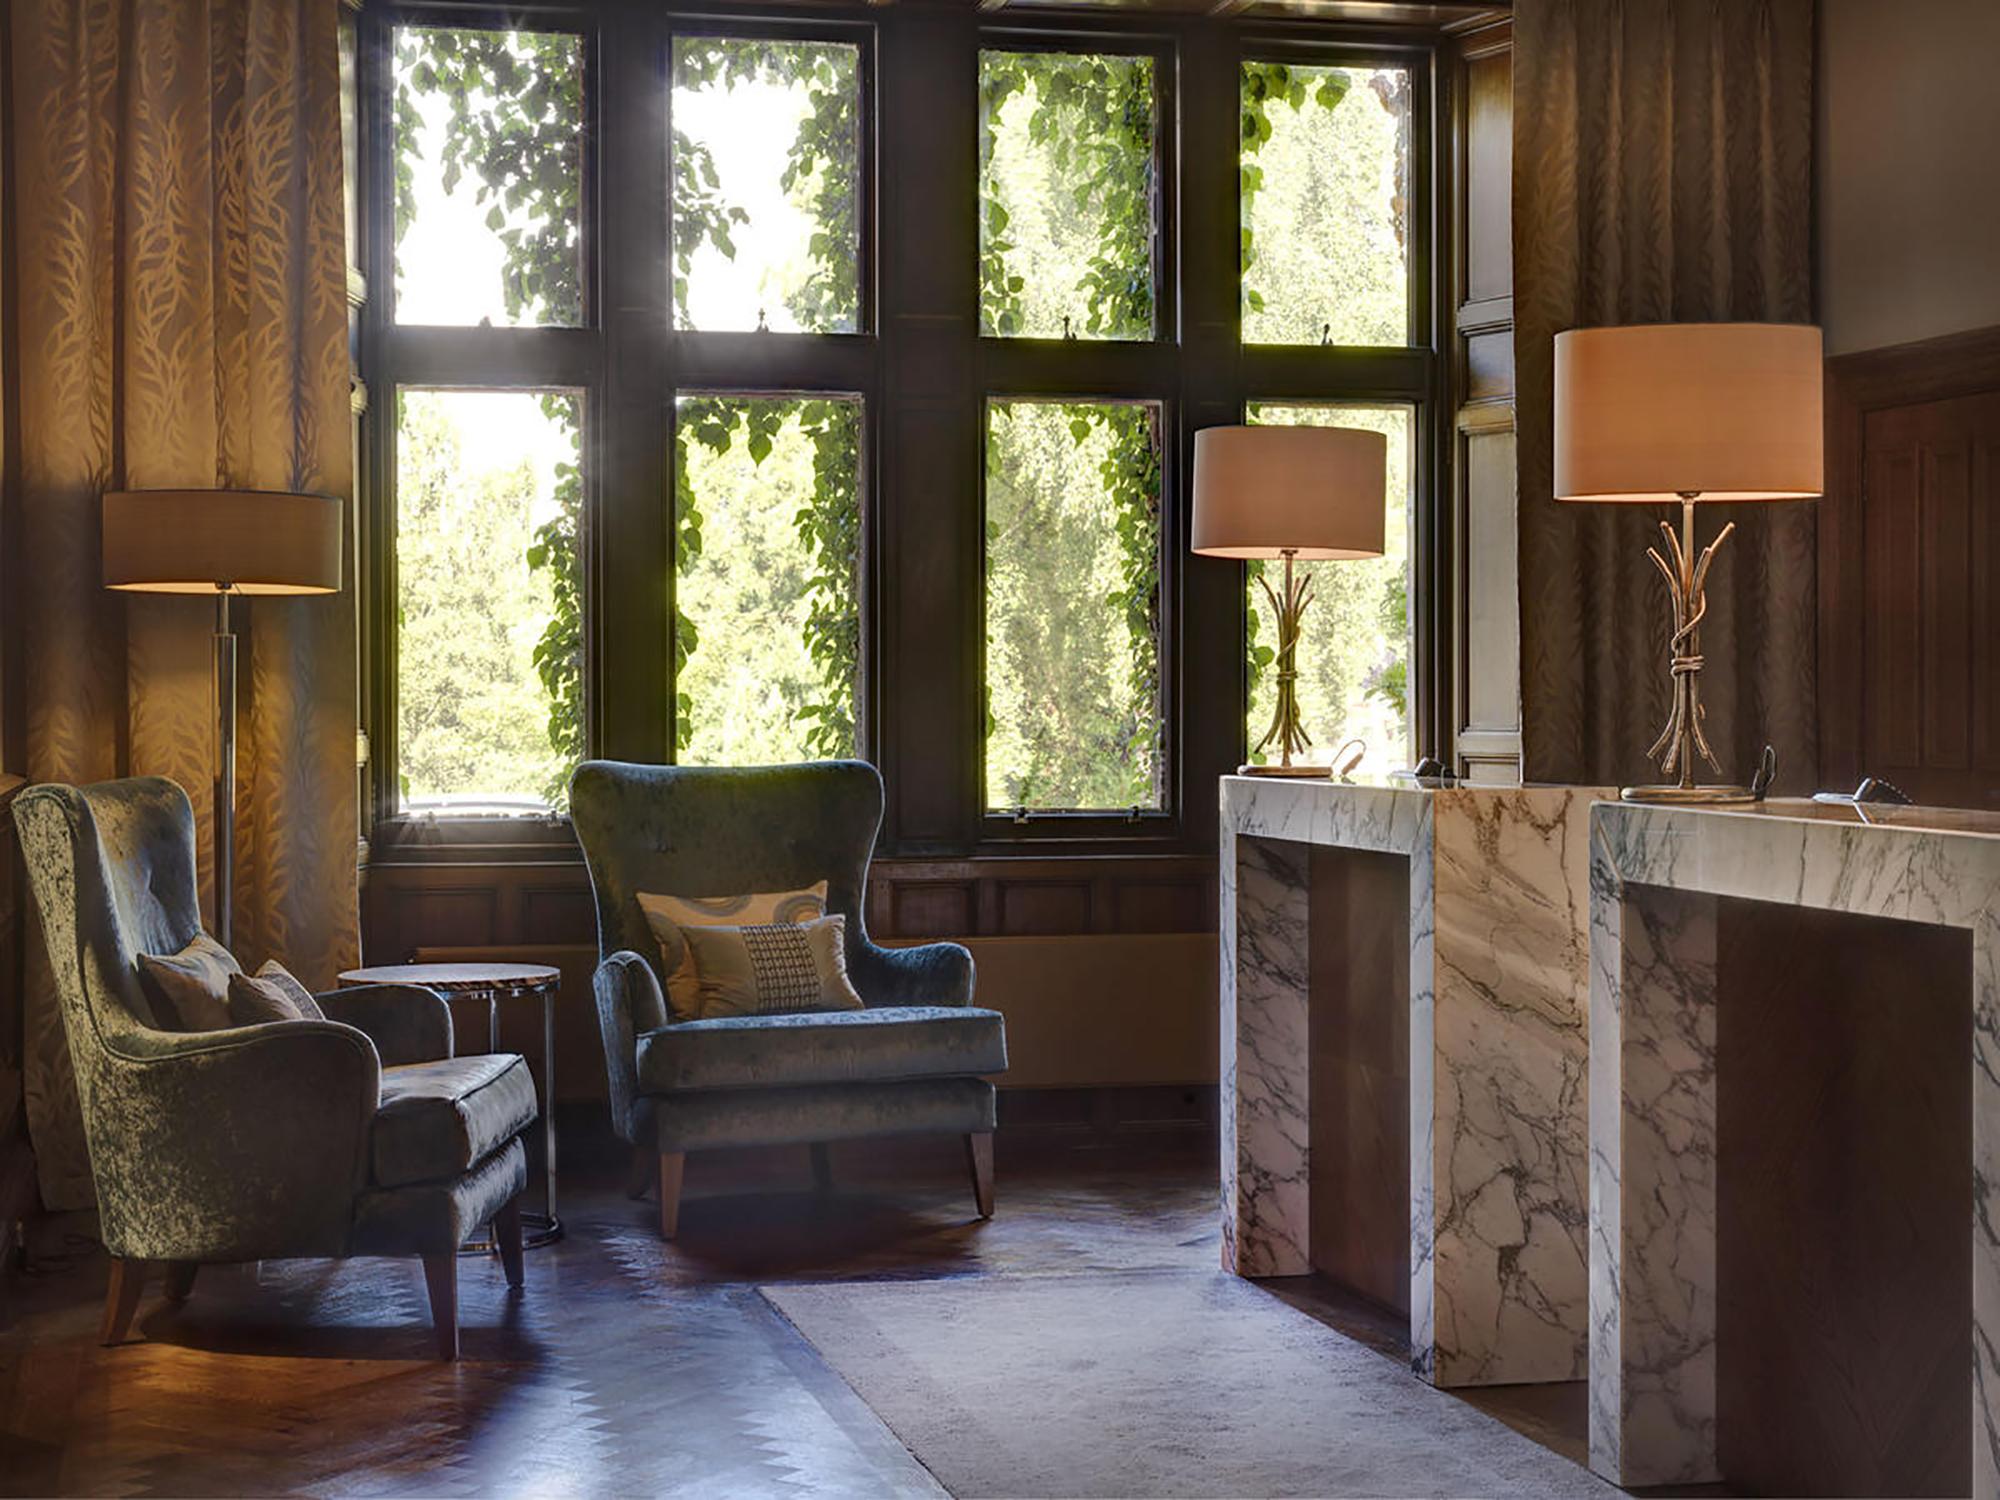 Hilton Grand Vacations at Craigendarroch Suites, Braemar